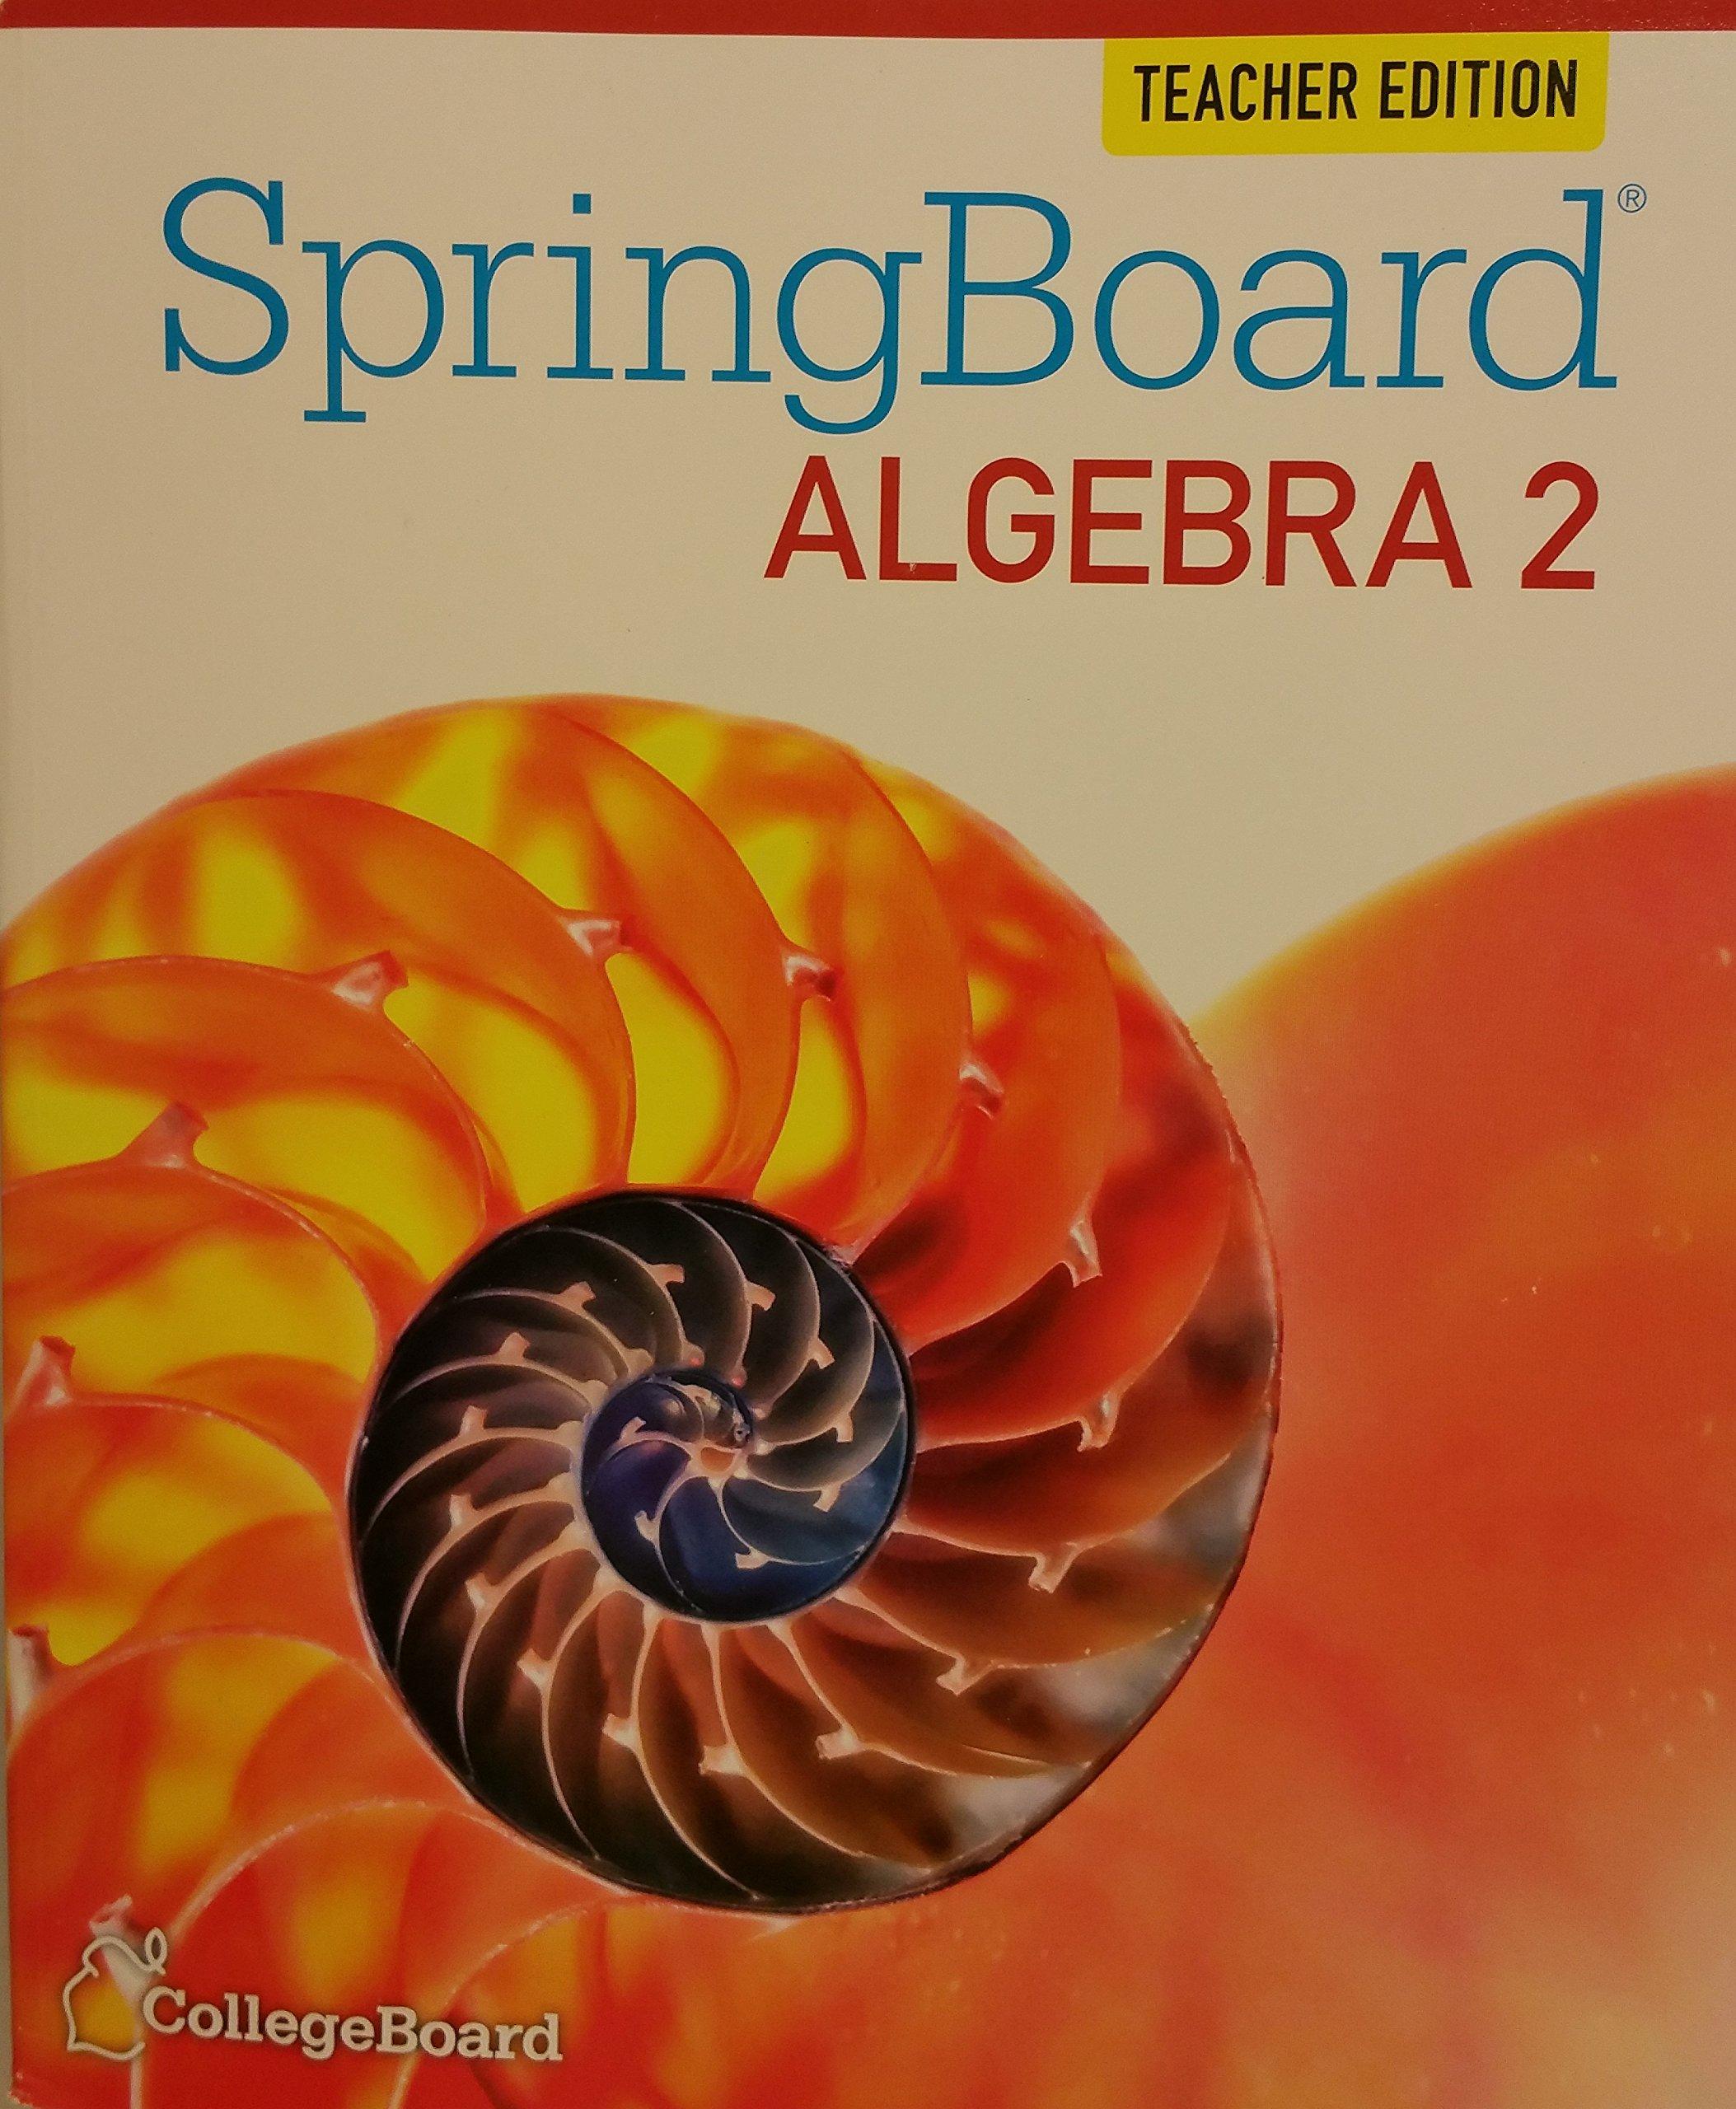 springboard algebra 2 embedded assessment 1 answers